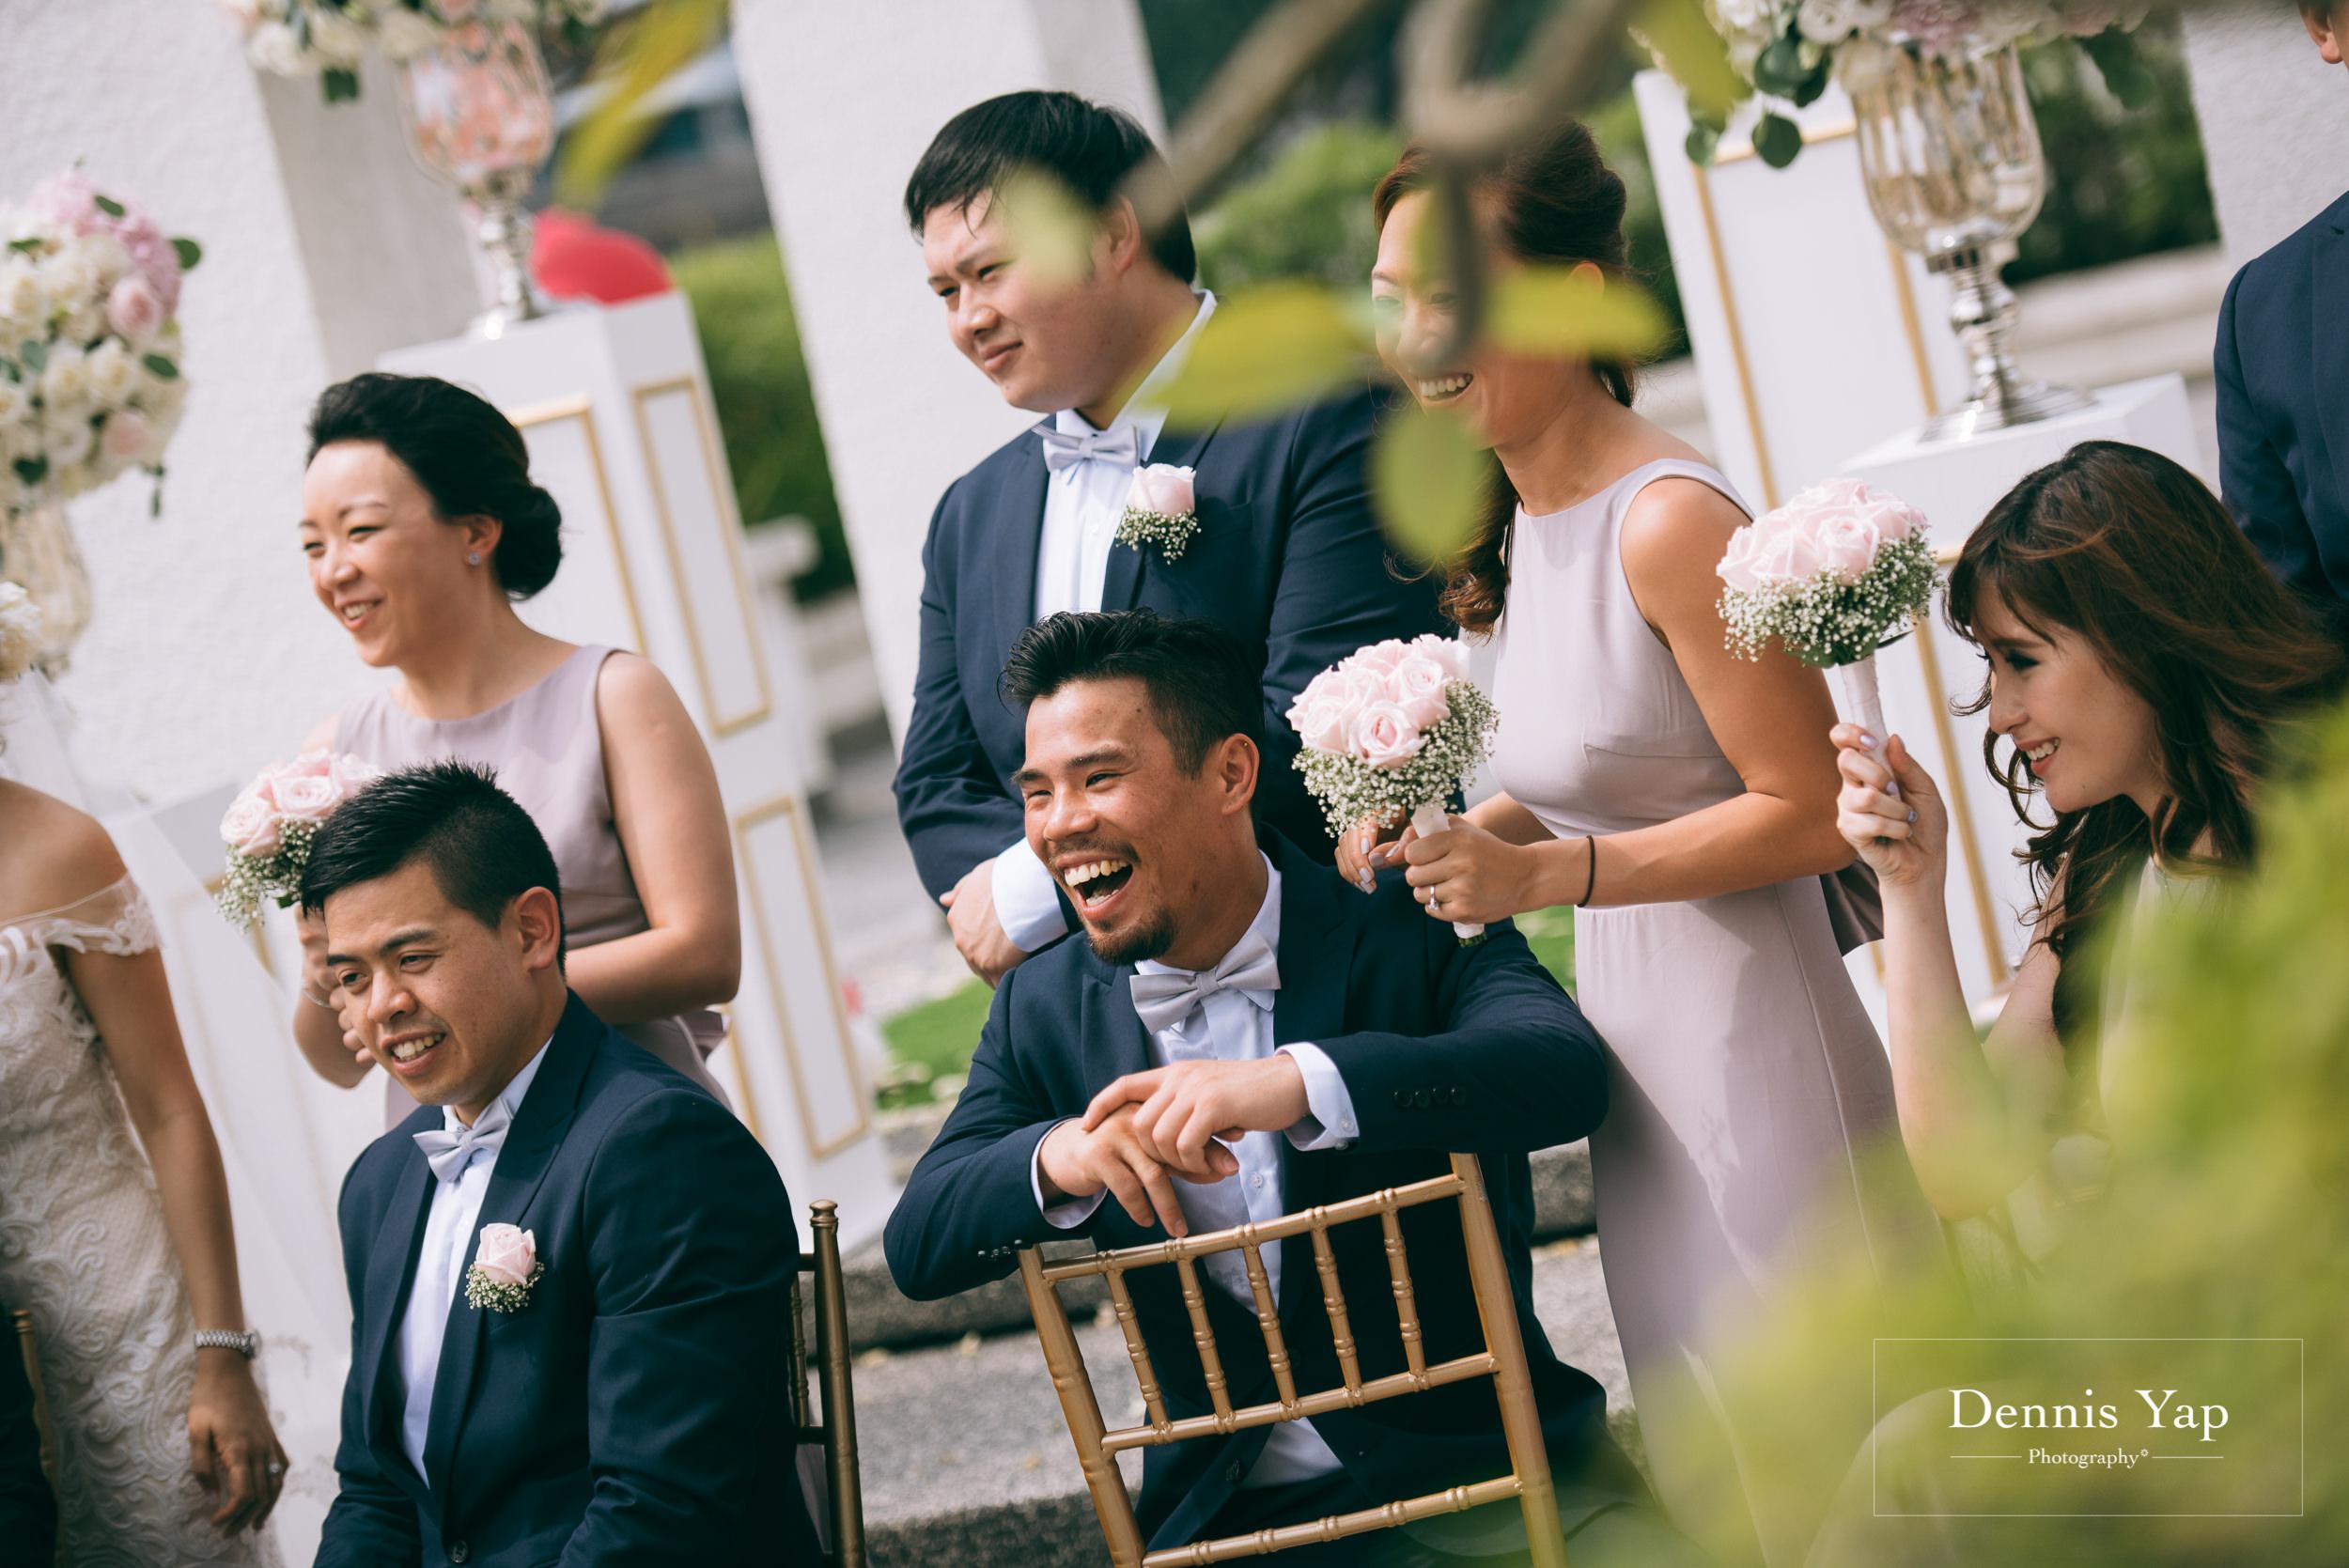 lionel joanne garden wedding majestic hotel dennis yap photography malaysia top wedding photographer-60.jpg